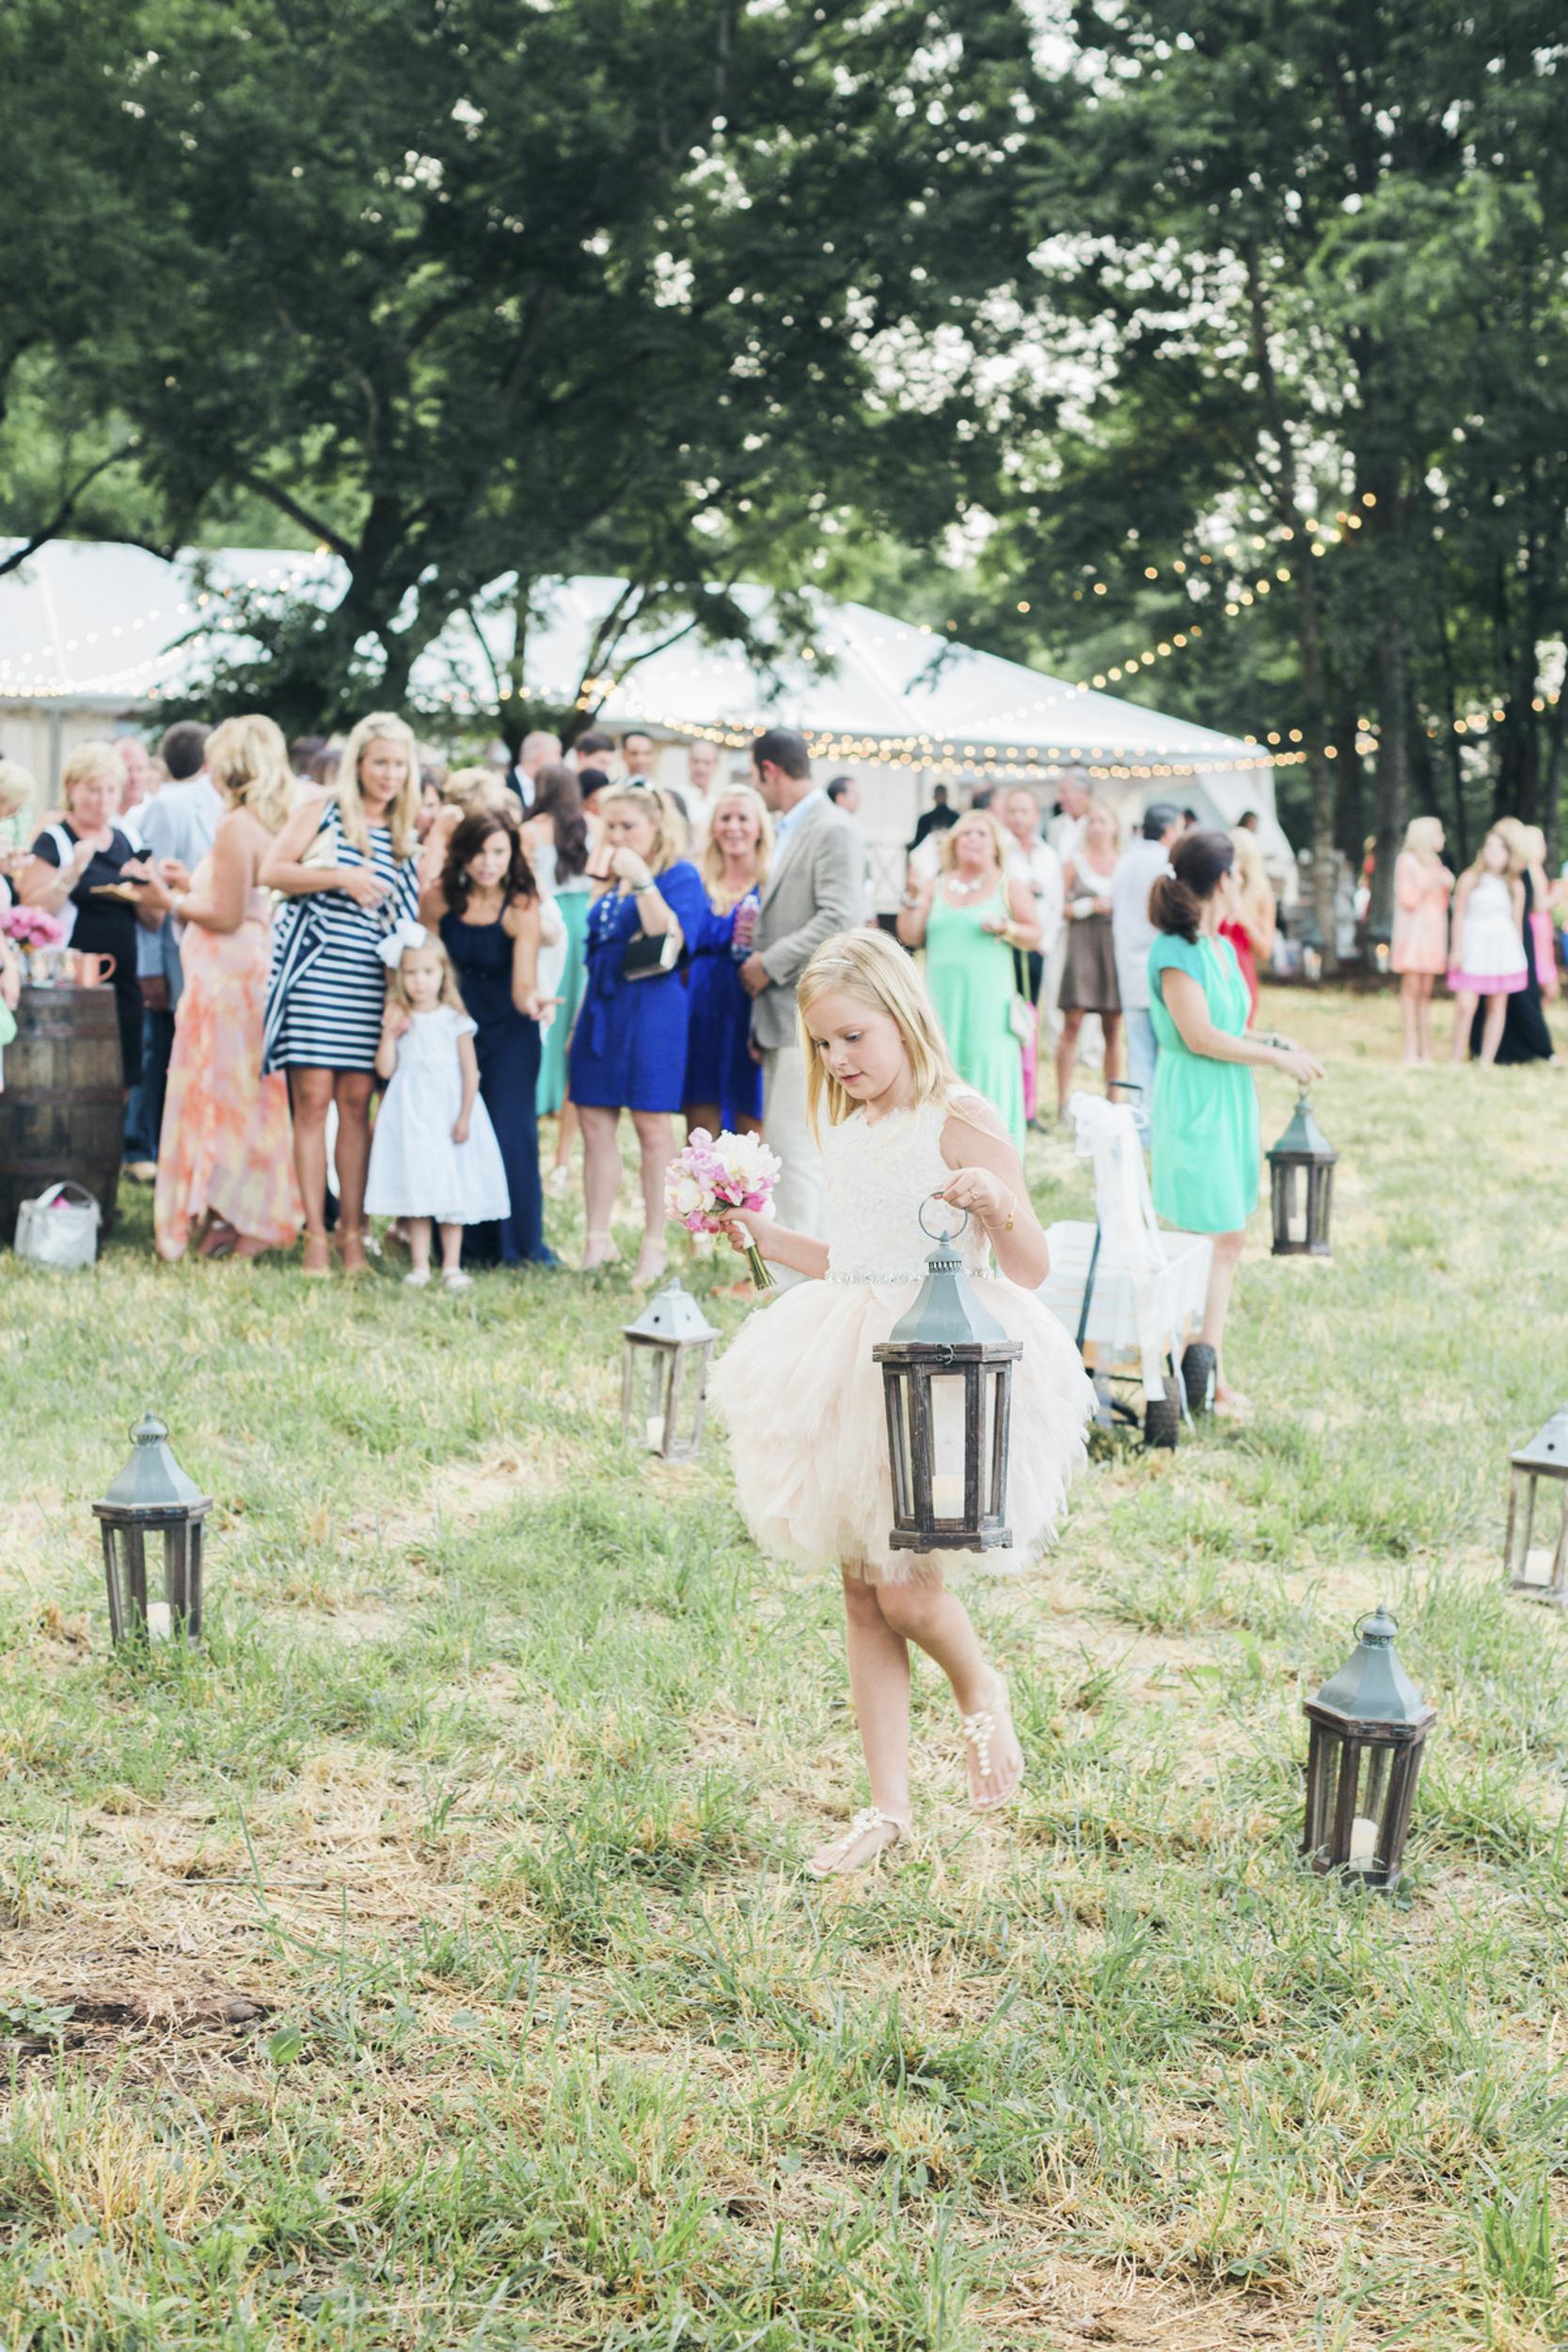 south_carolina_farm_wedding_rustic_chic_surprise_secret_luxe_wedding_bachelorette_emily_maynard_real_weddings-27.jpg